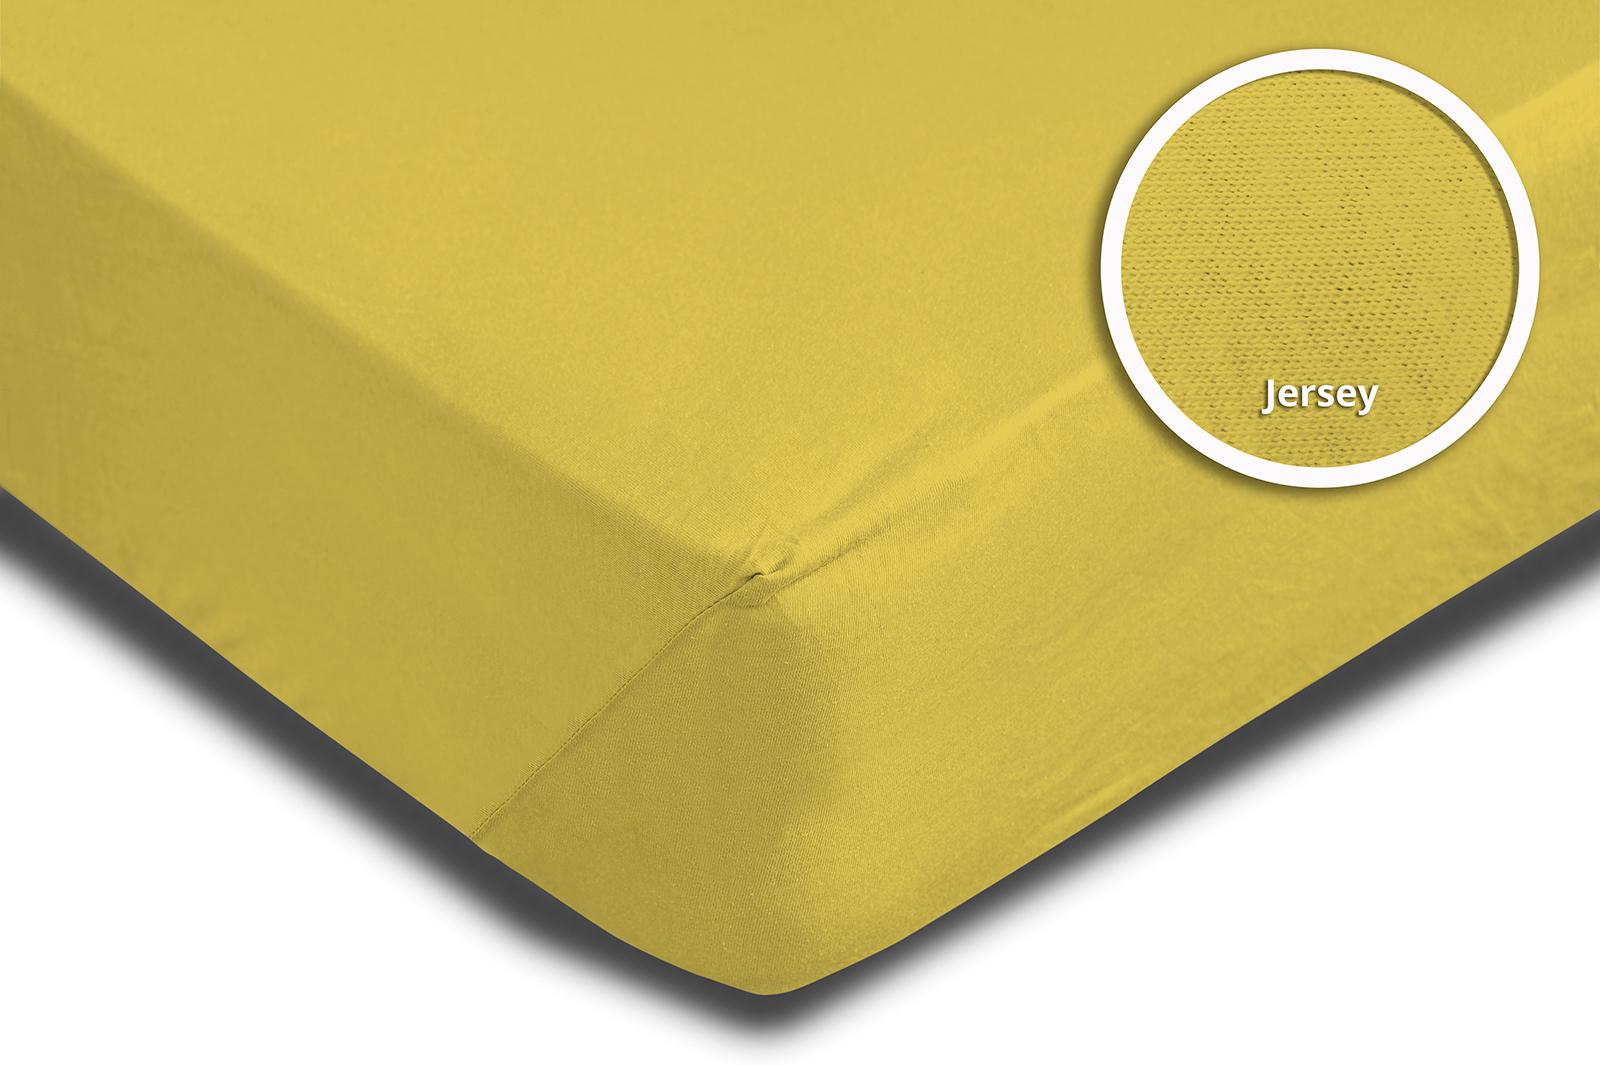 spannbettlaken 180x200 cm 200x220 cm gelb jersey boxspringbett wasserbett spannbettlaken. Black Bedroom Furniture Sets. Home Design Ideas